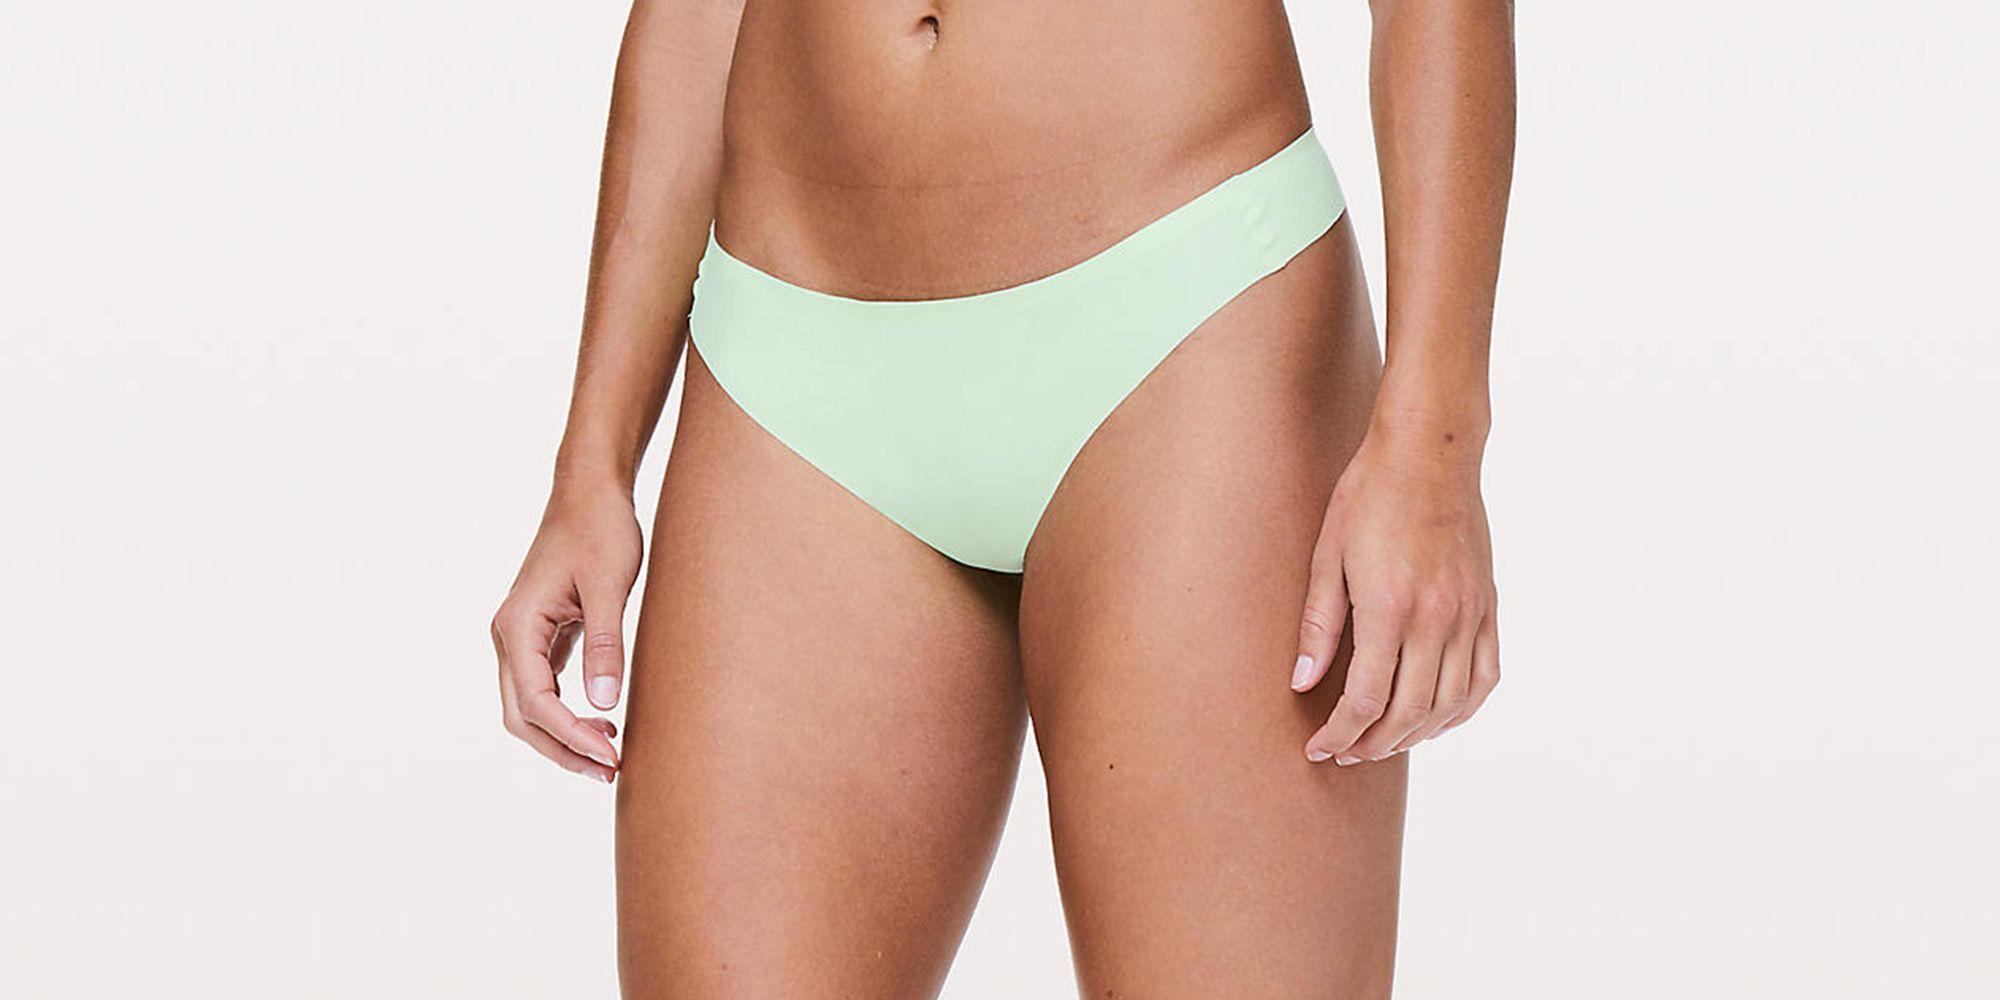 b81b080010e6 The Best Underwear for Every Workout - Workout Underwear